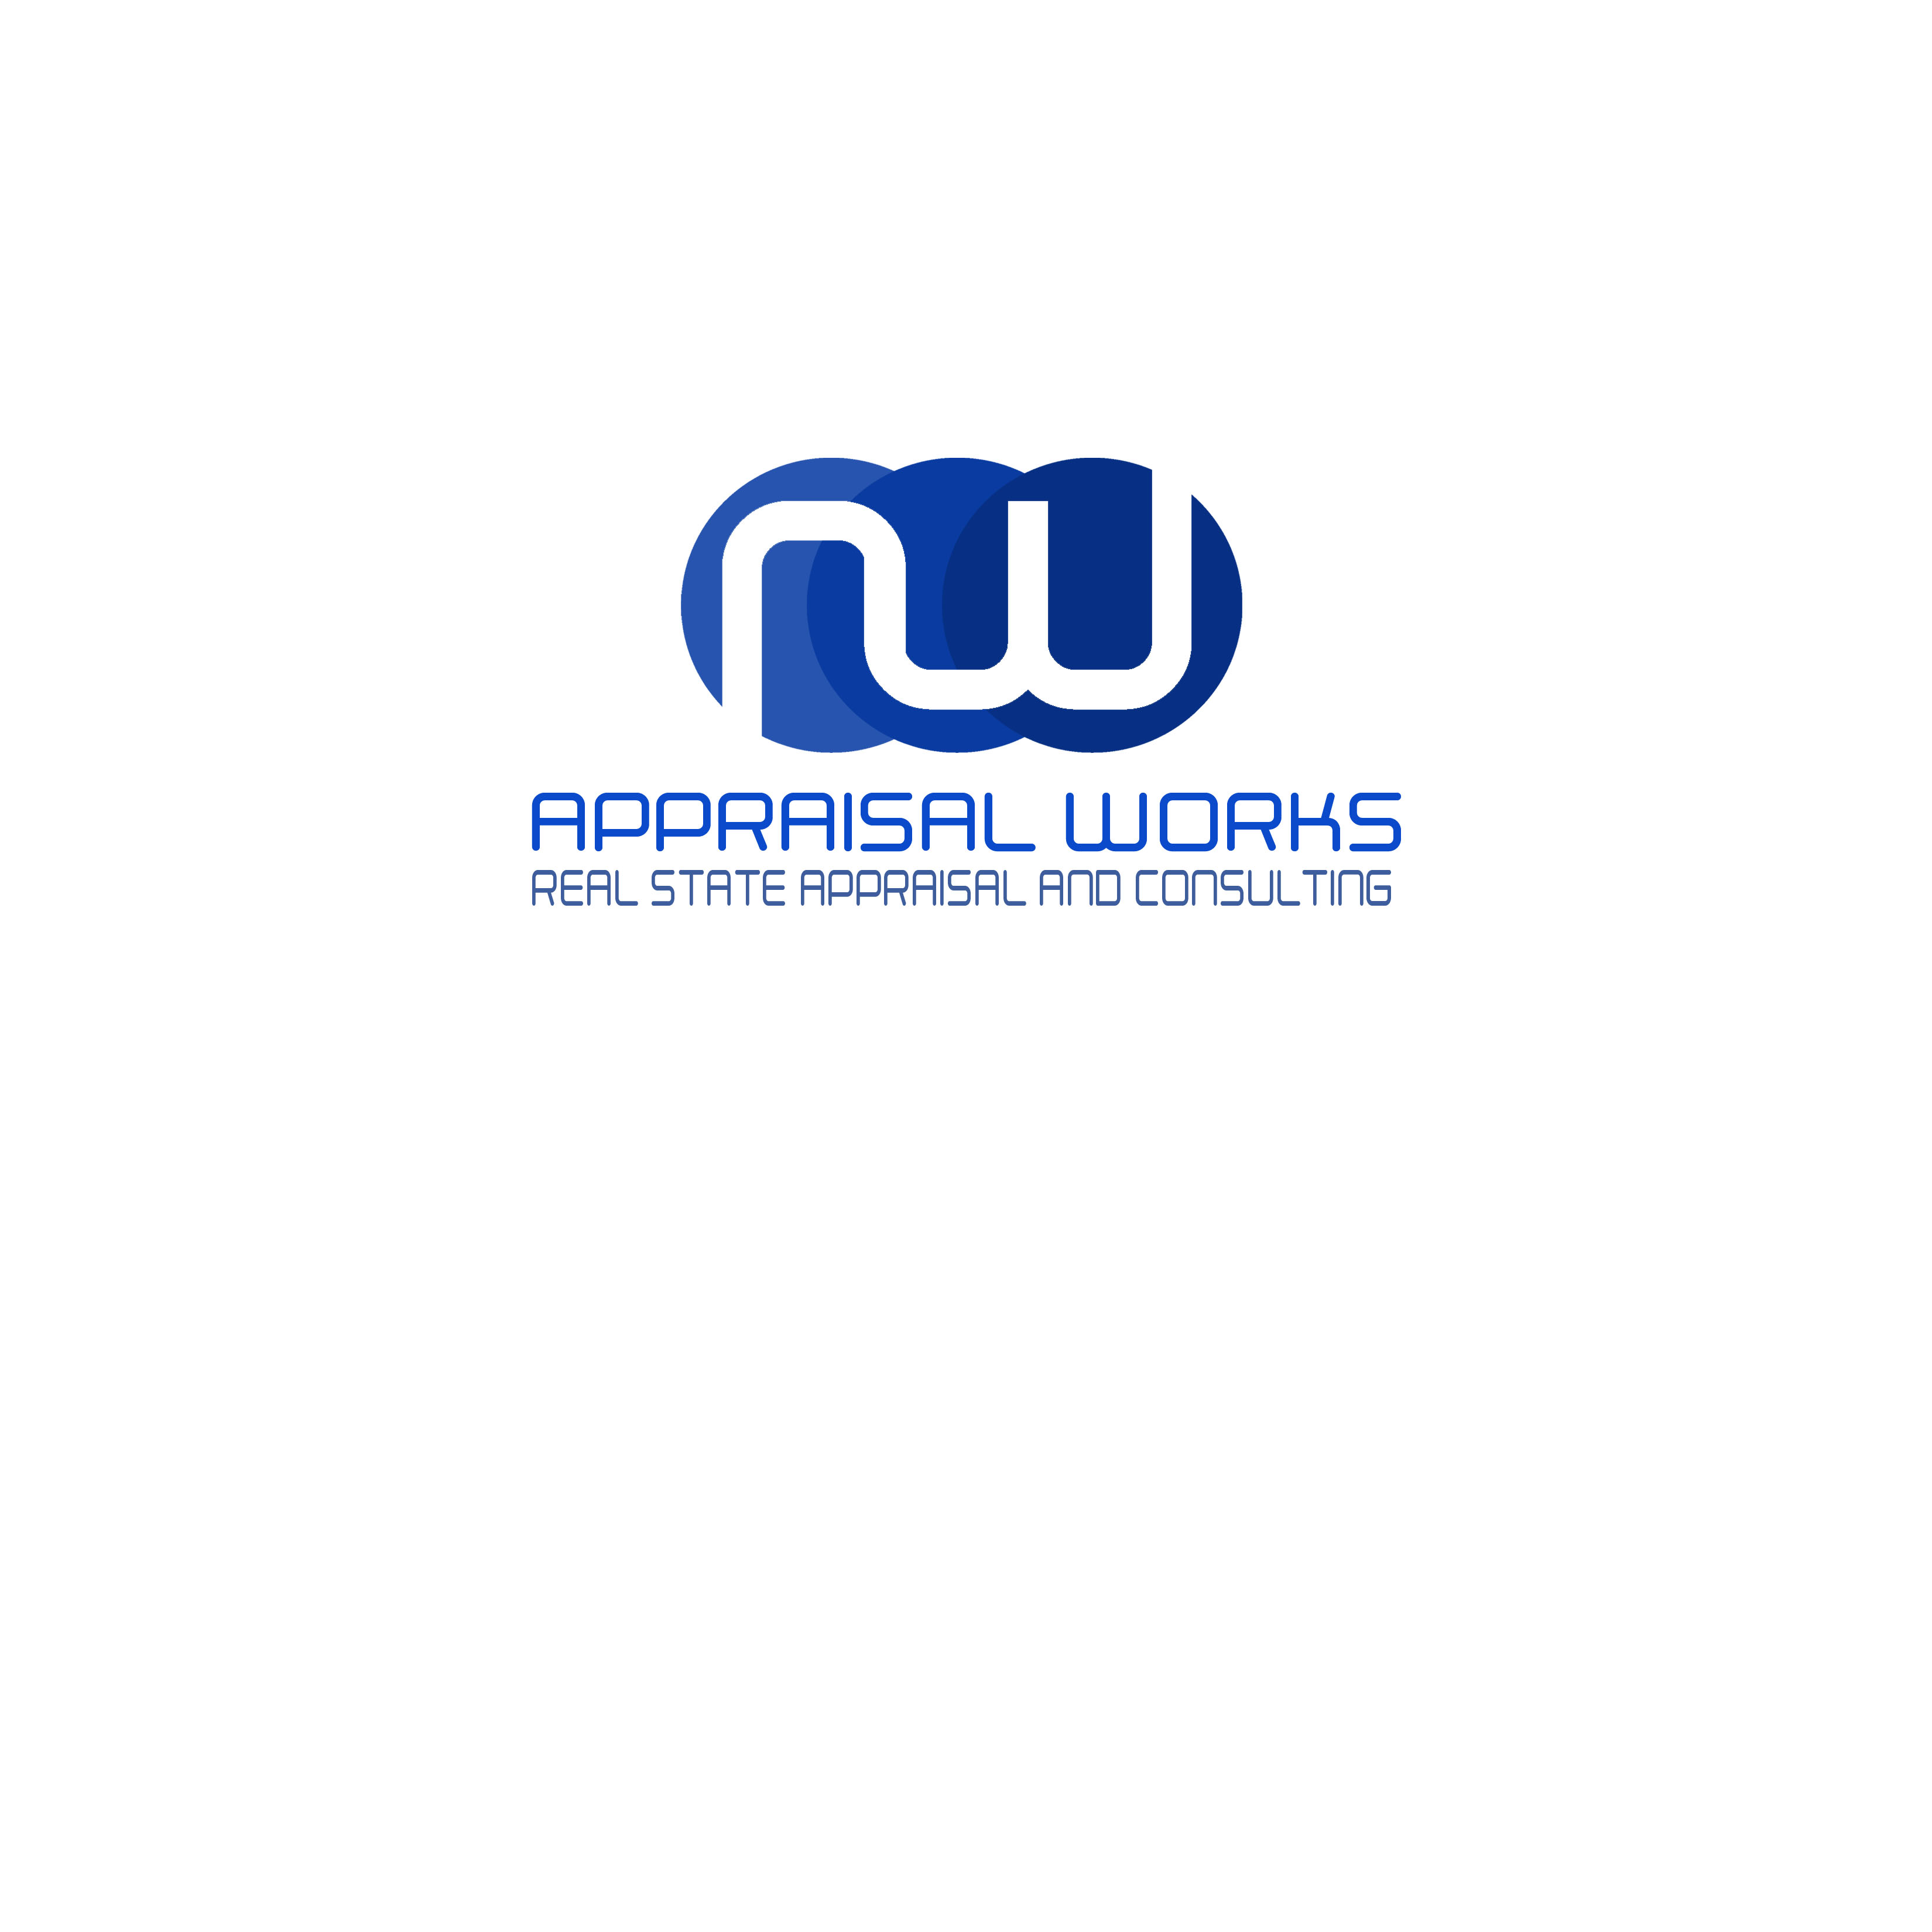 Logo Design by Allan Esclamado - Entry No. 61 in the Logo Design Contest Appraisal Works Logo Design.